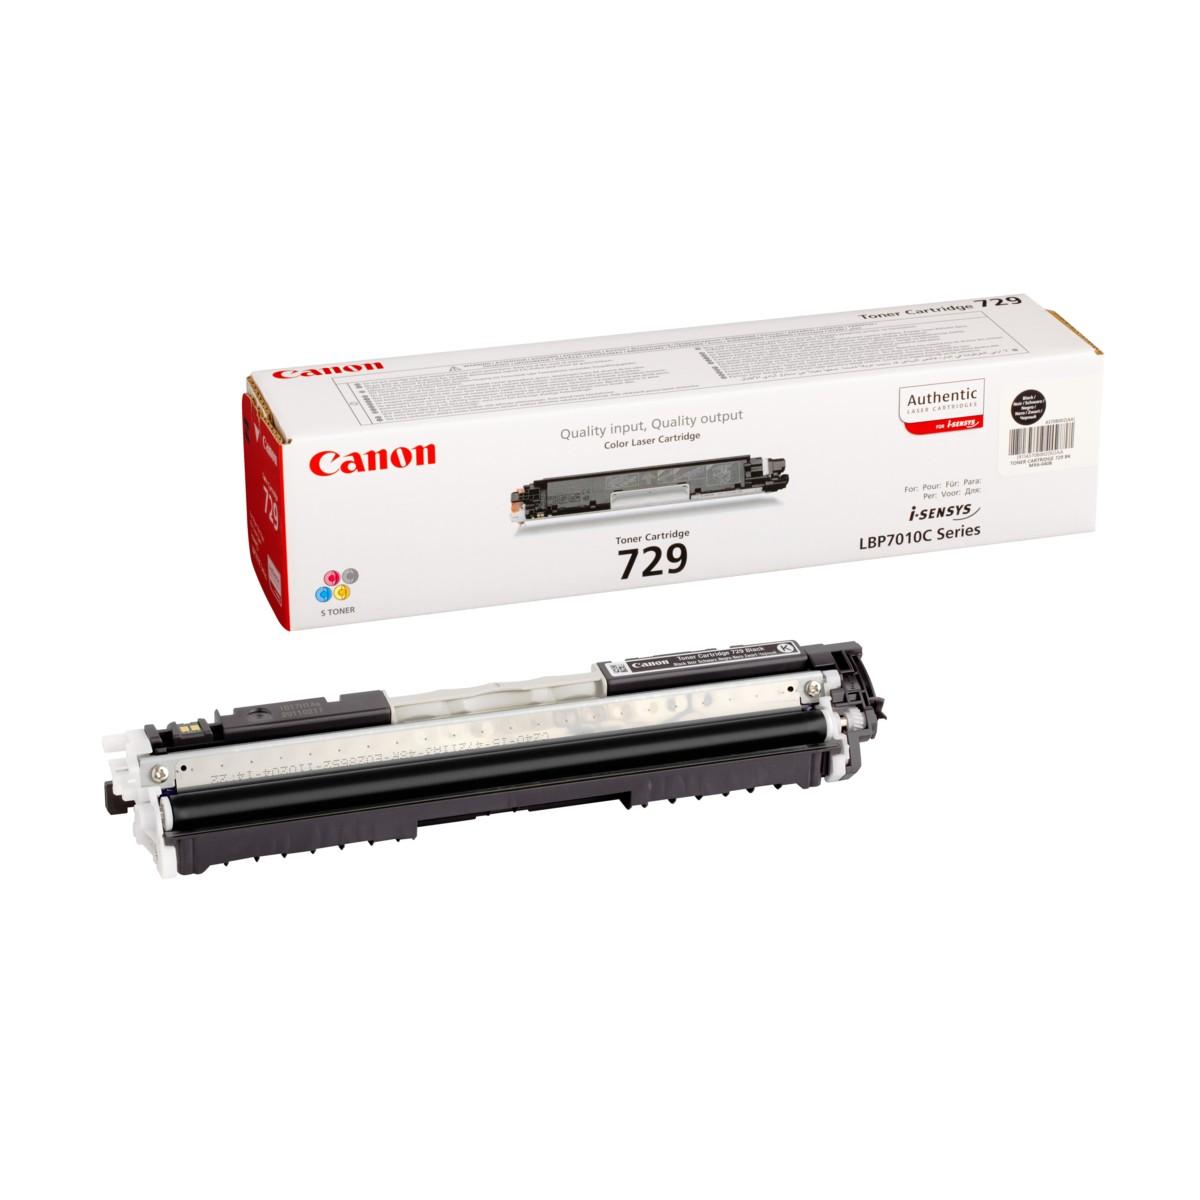 Toner Canon 729, CRG-729, 4370B002 - originálný (Čierny)